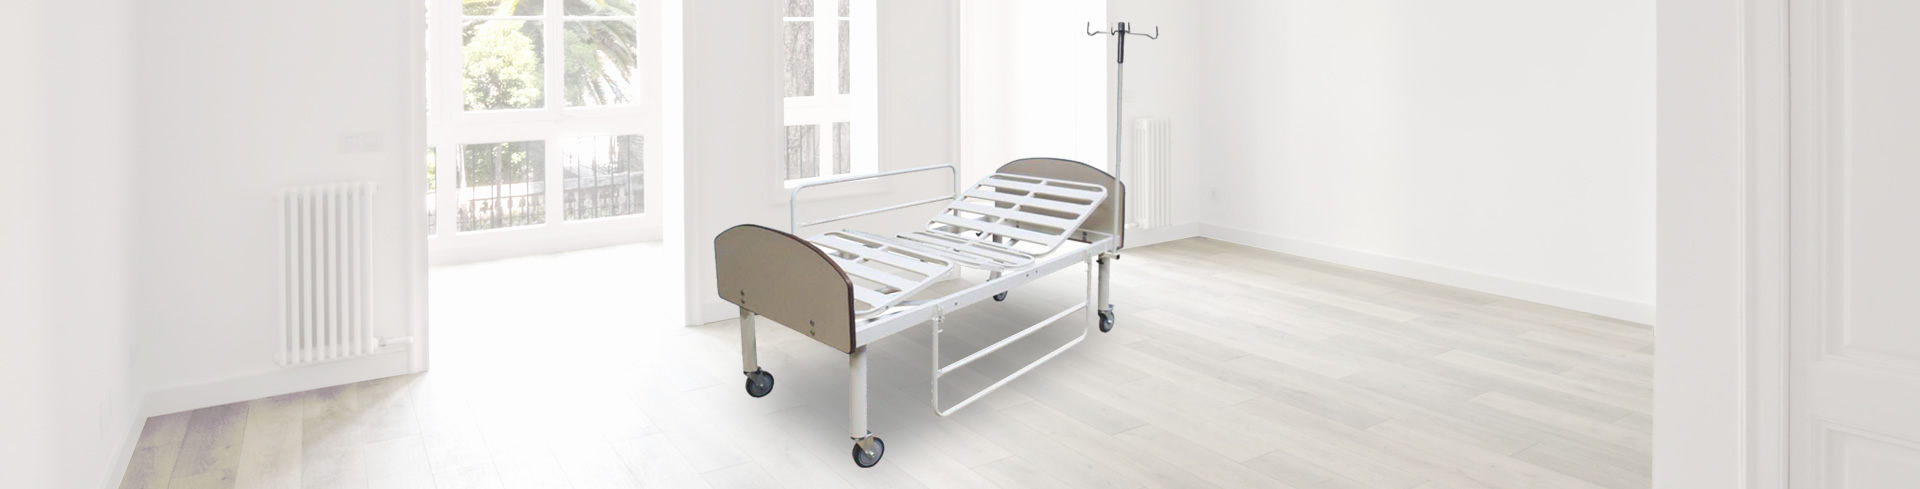 cama-hospitalaria-electrico